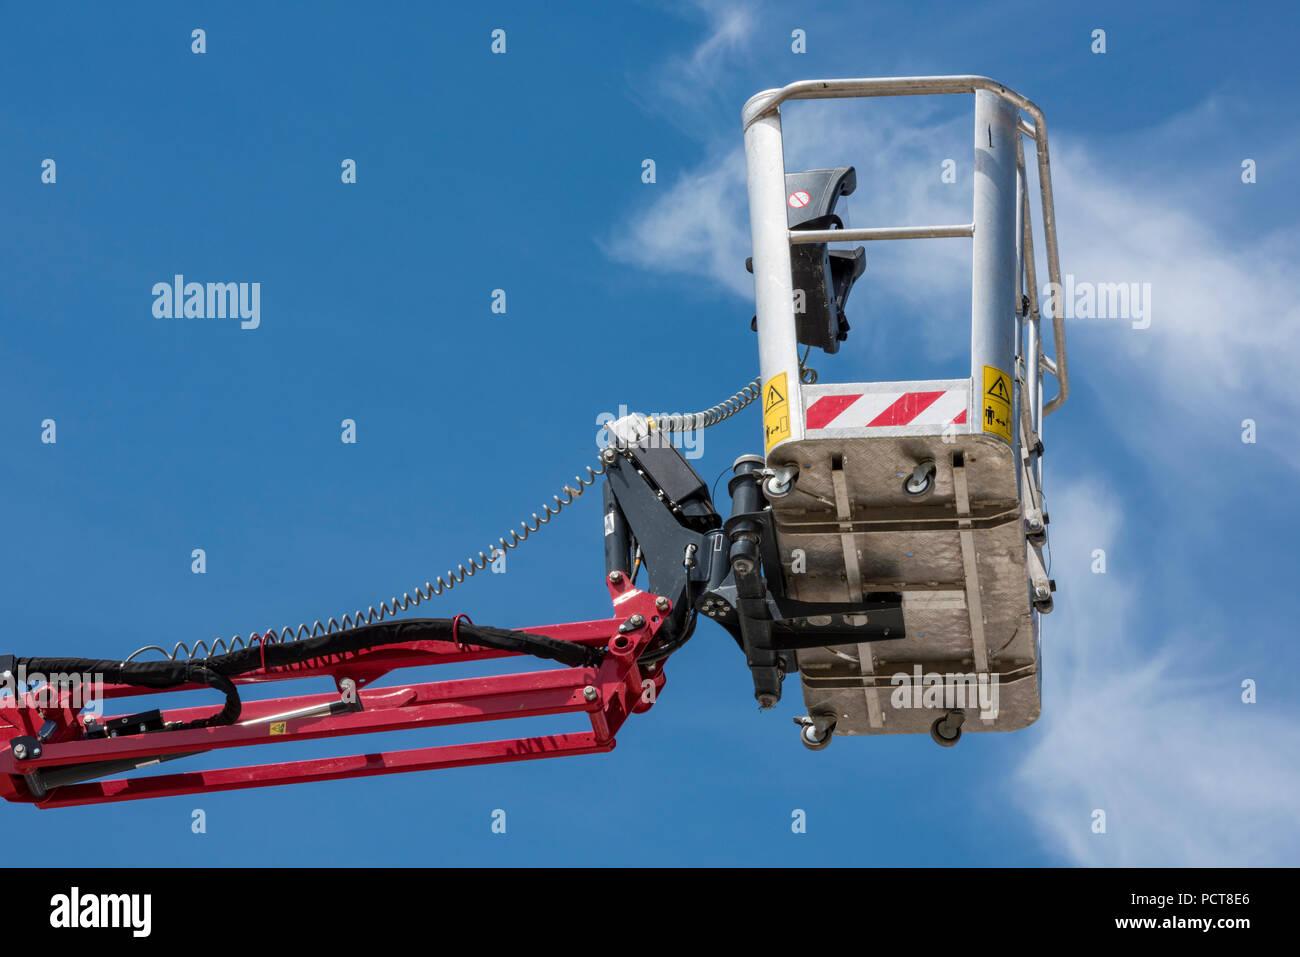 cherry picker or mobile elevated work platform basket or